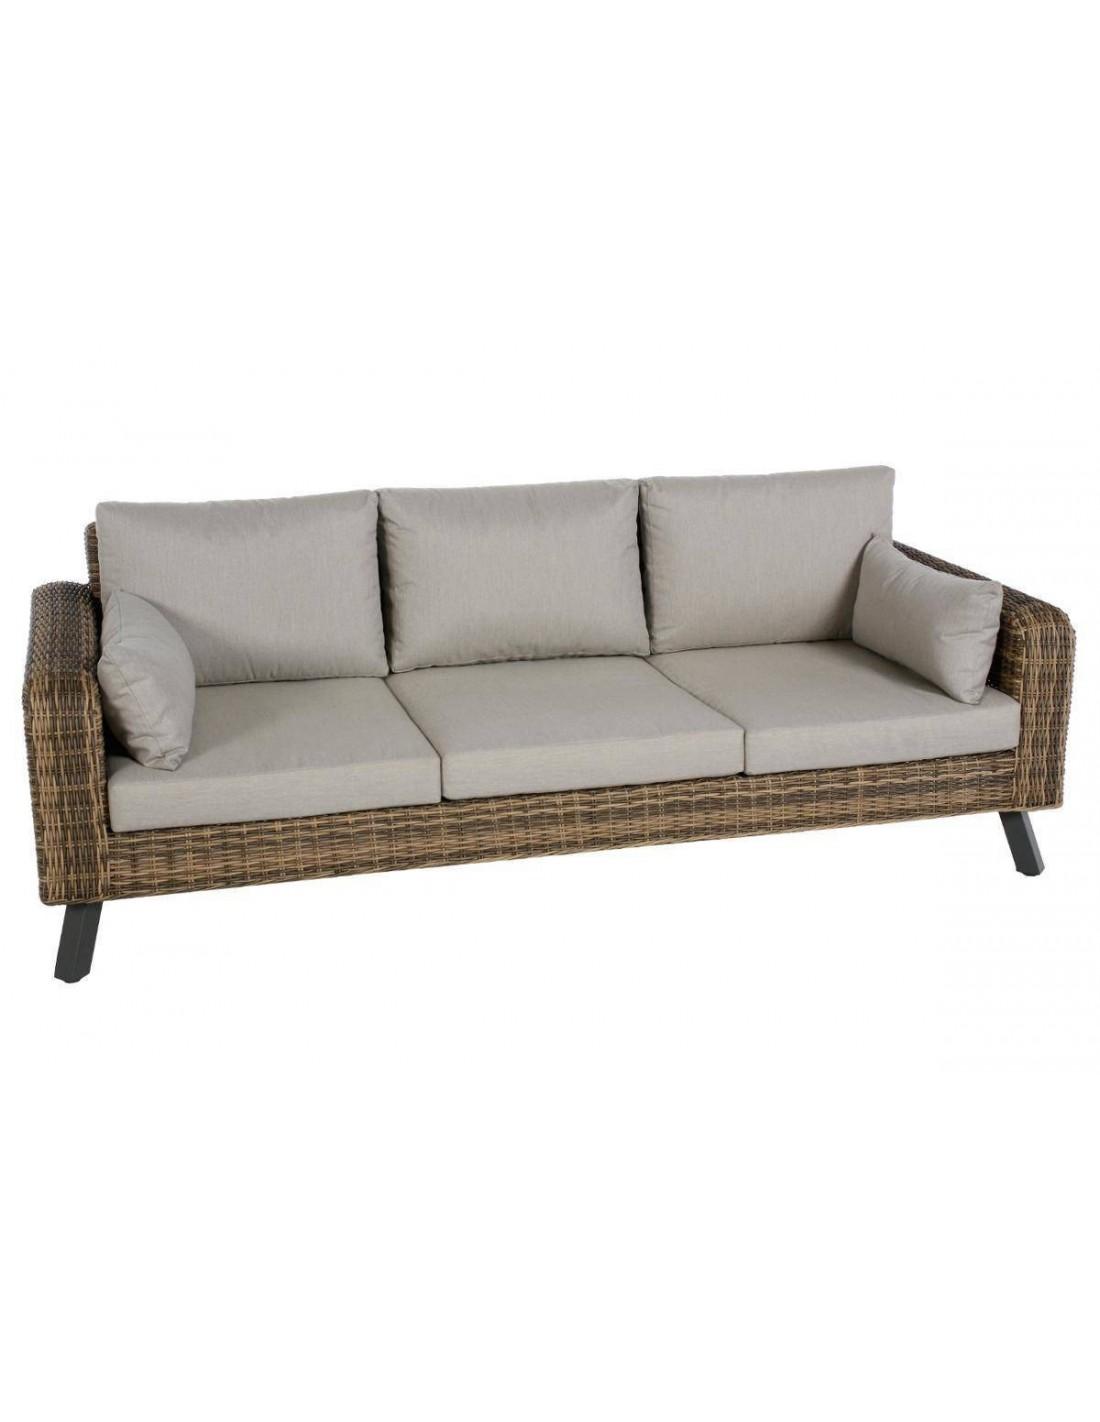 salon de jardin aura naturae aluminium et r sine tress e. Black Bedroom Furniture Sets. Home Design Ideas